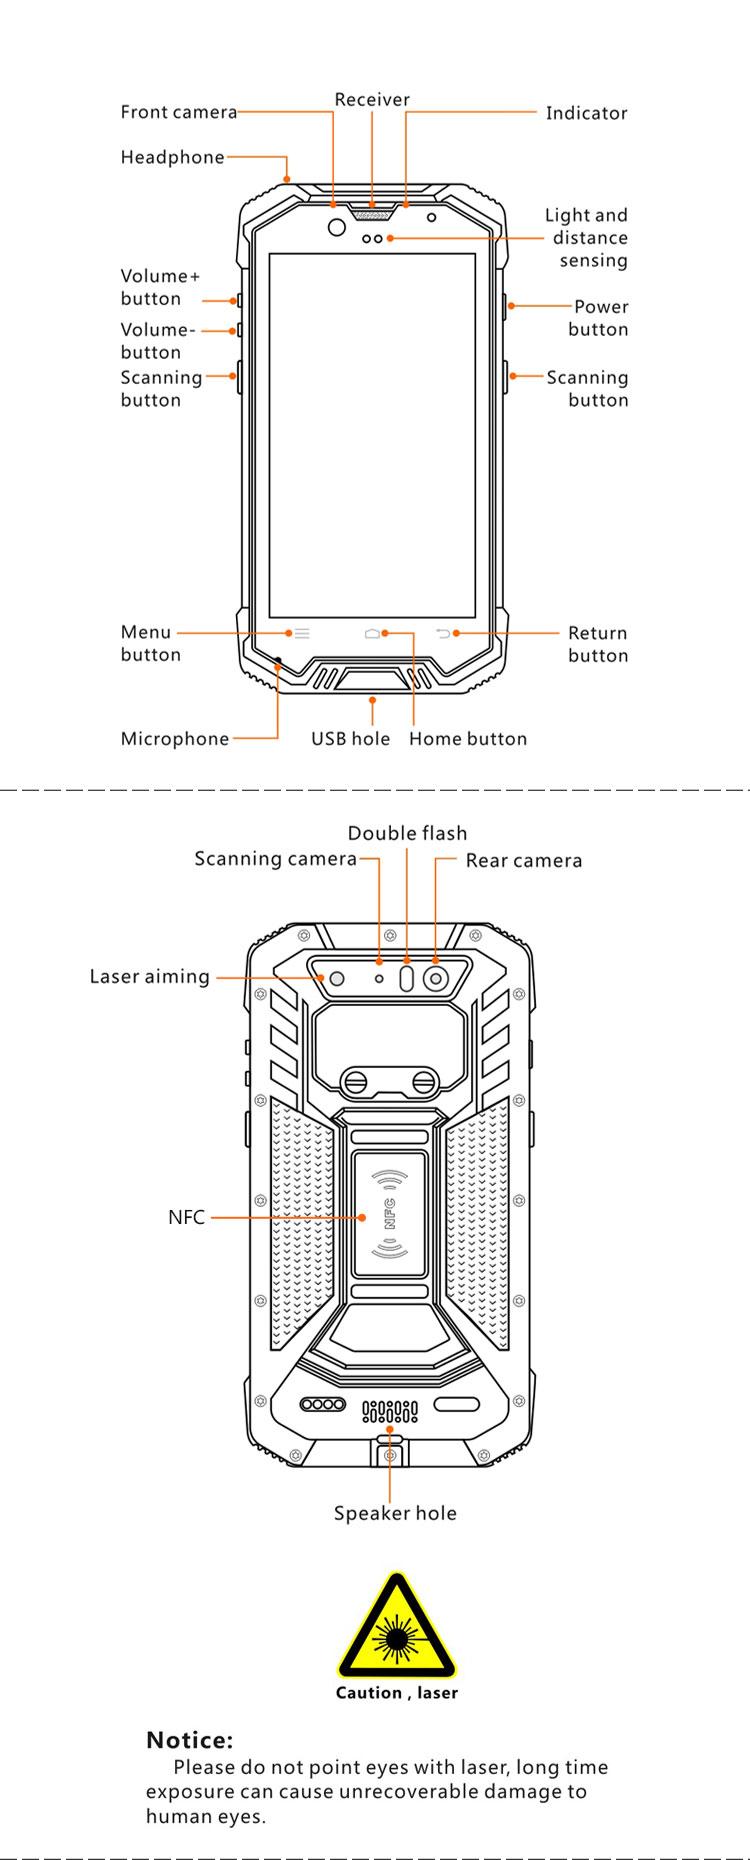 5200amh Battery Ip68 Rugged Portable Data Terminal 2d